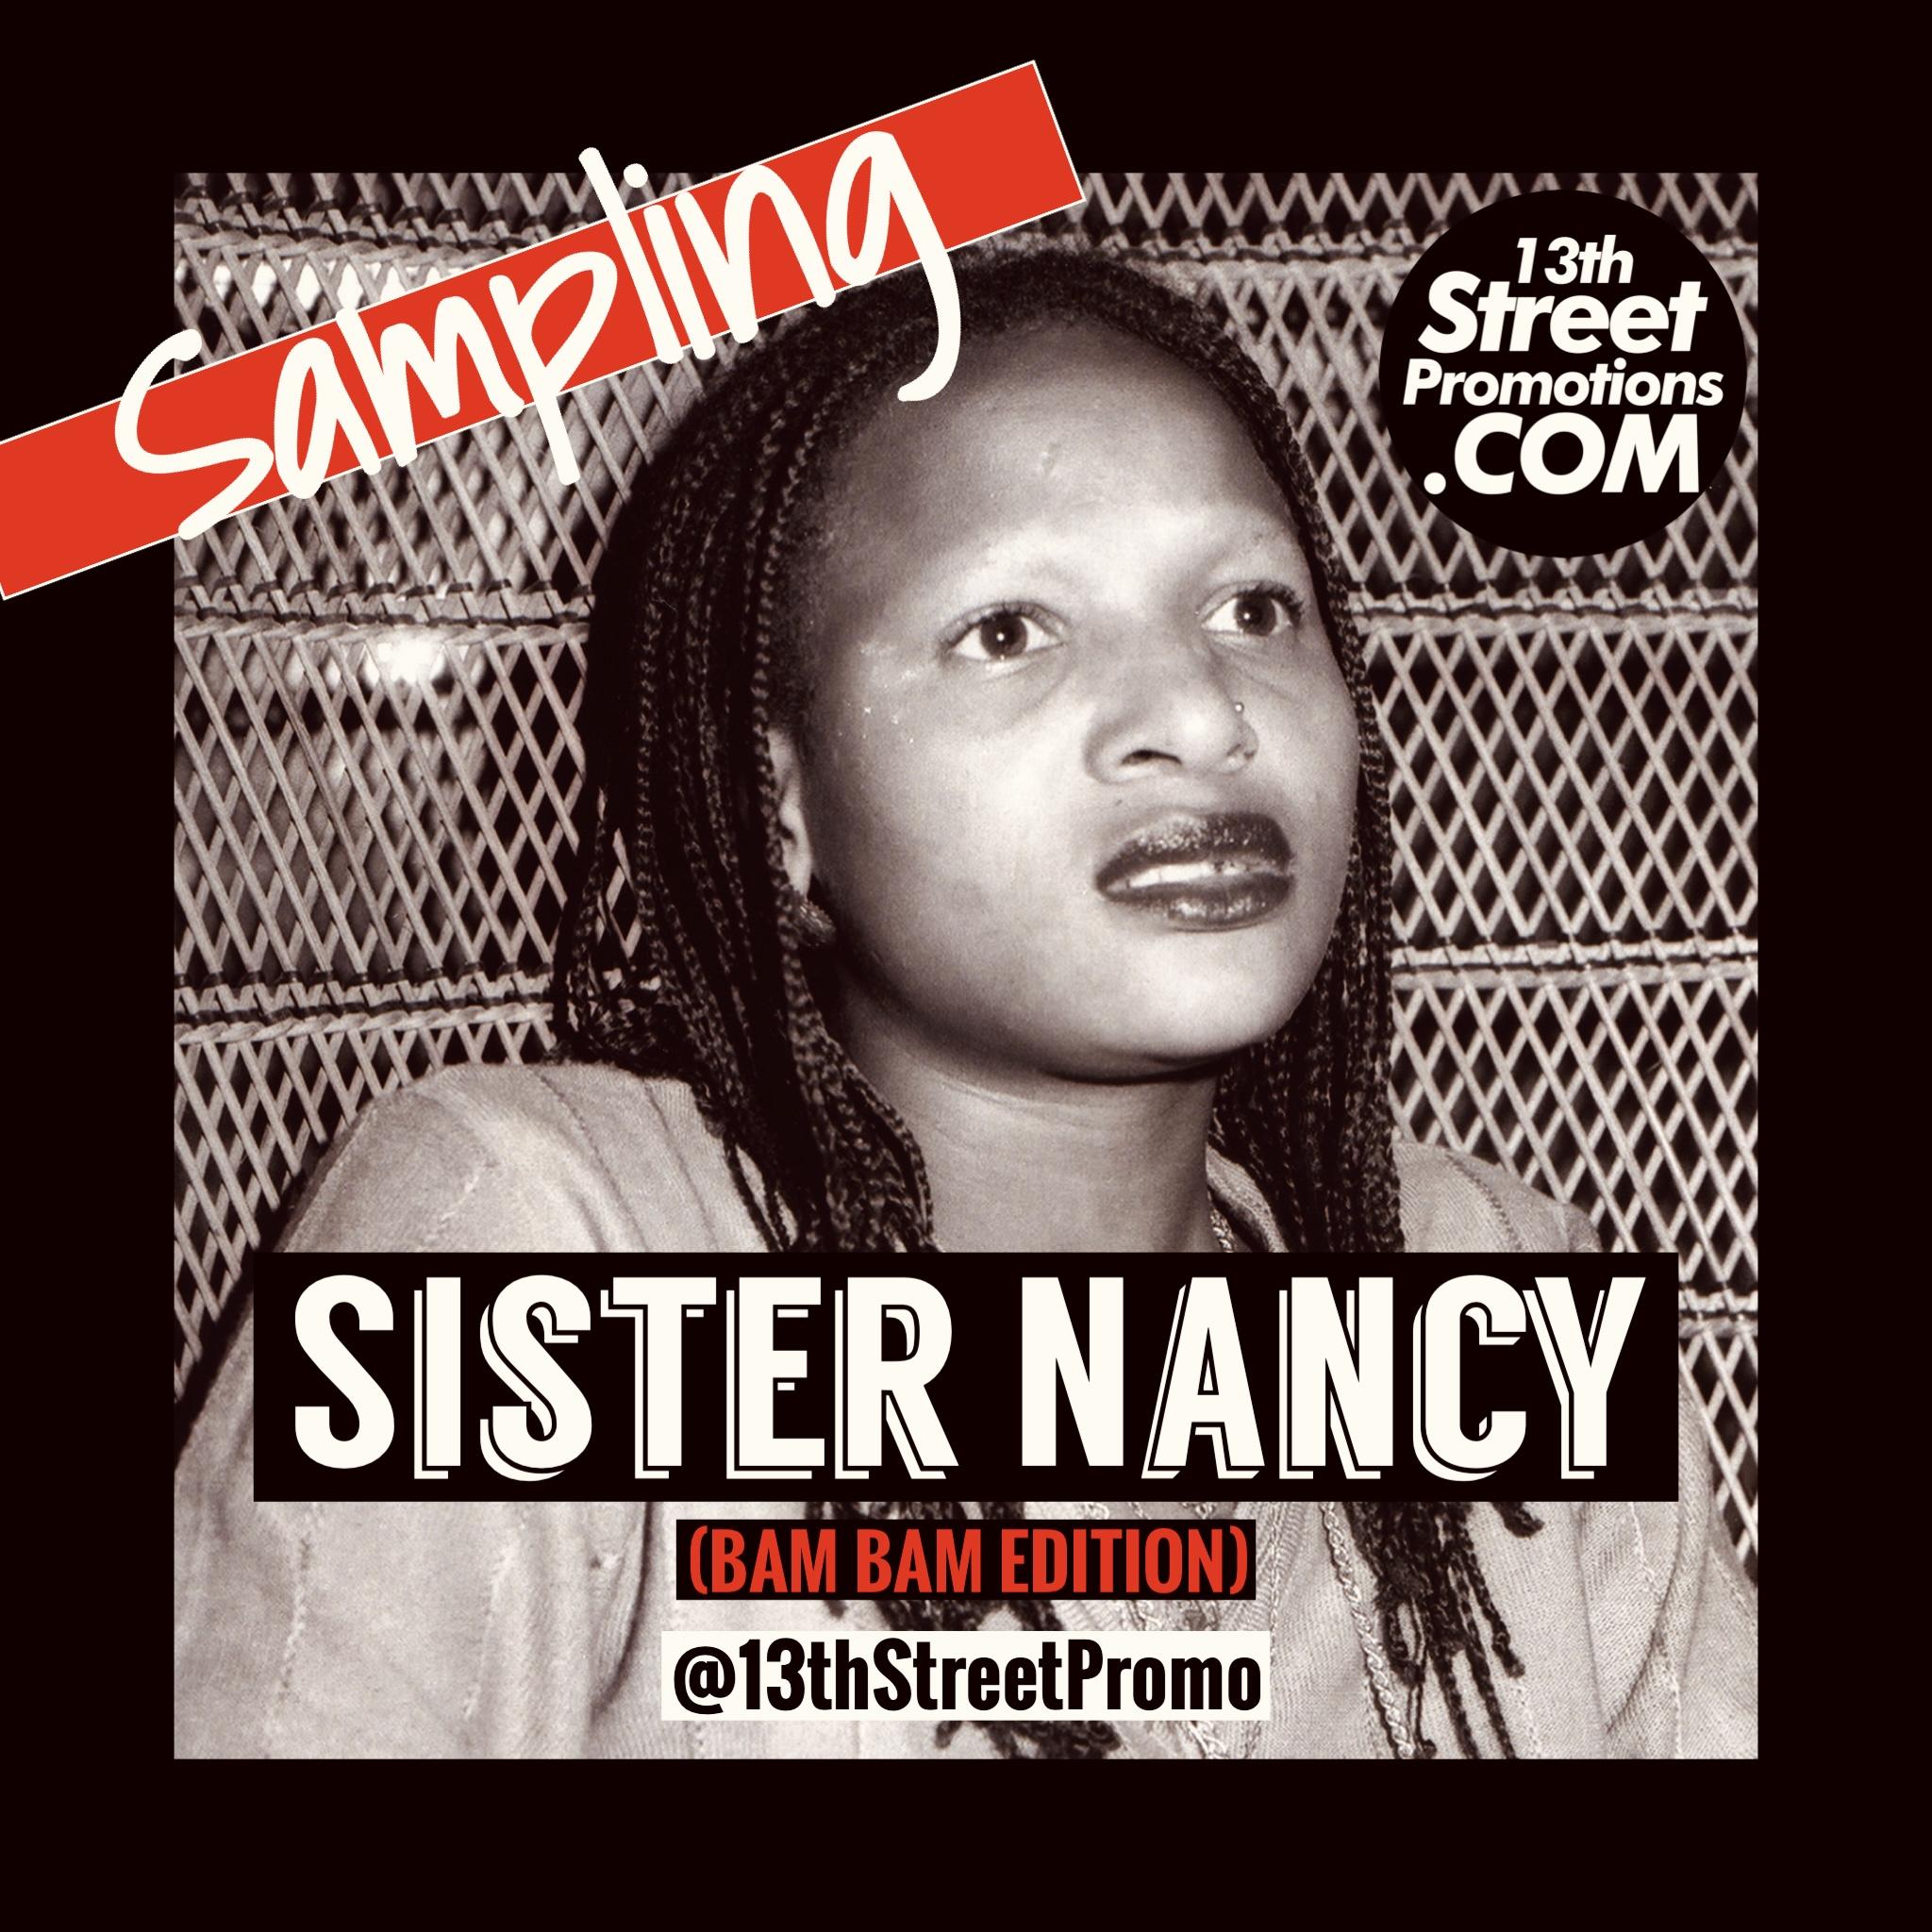 Jamaica Dancehall One Two 1, 2 Sister Nancy 13thStreetPromotions 13thStreetPRomo Playlist Sampling Bam Bam 1982 Caribbean